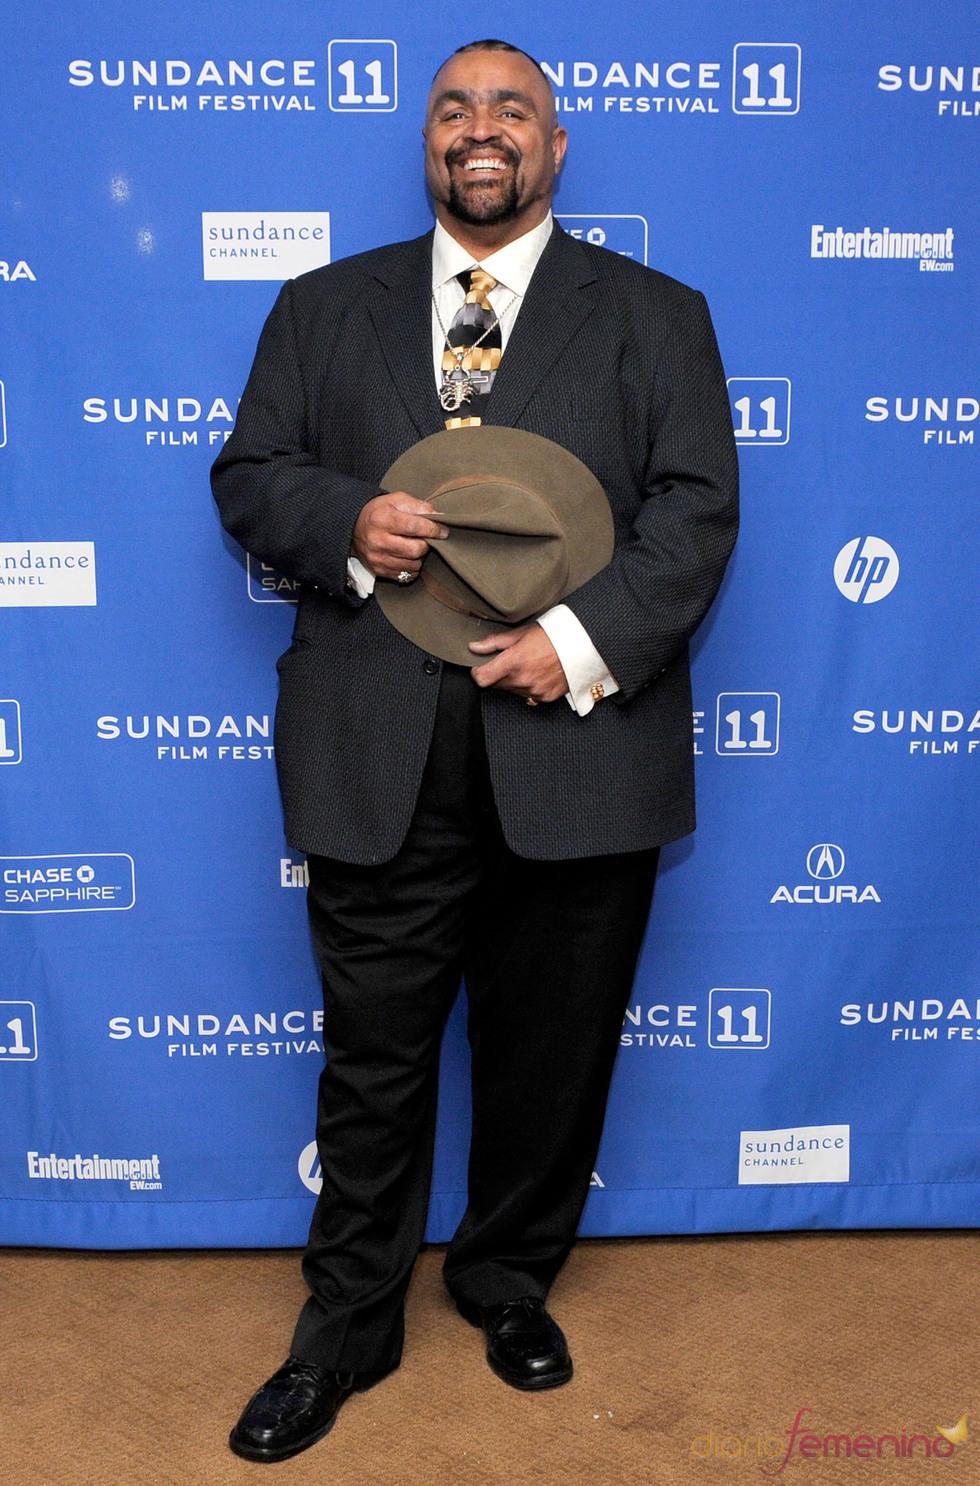 Rico A. Comic en el Festival de Cine Sundance 2011